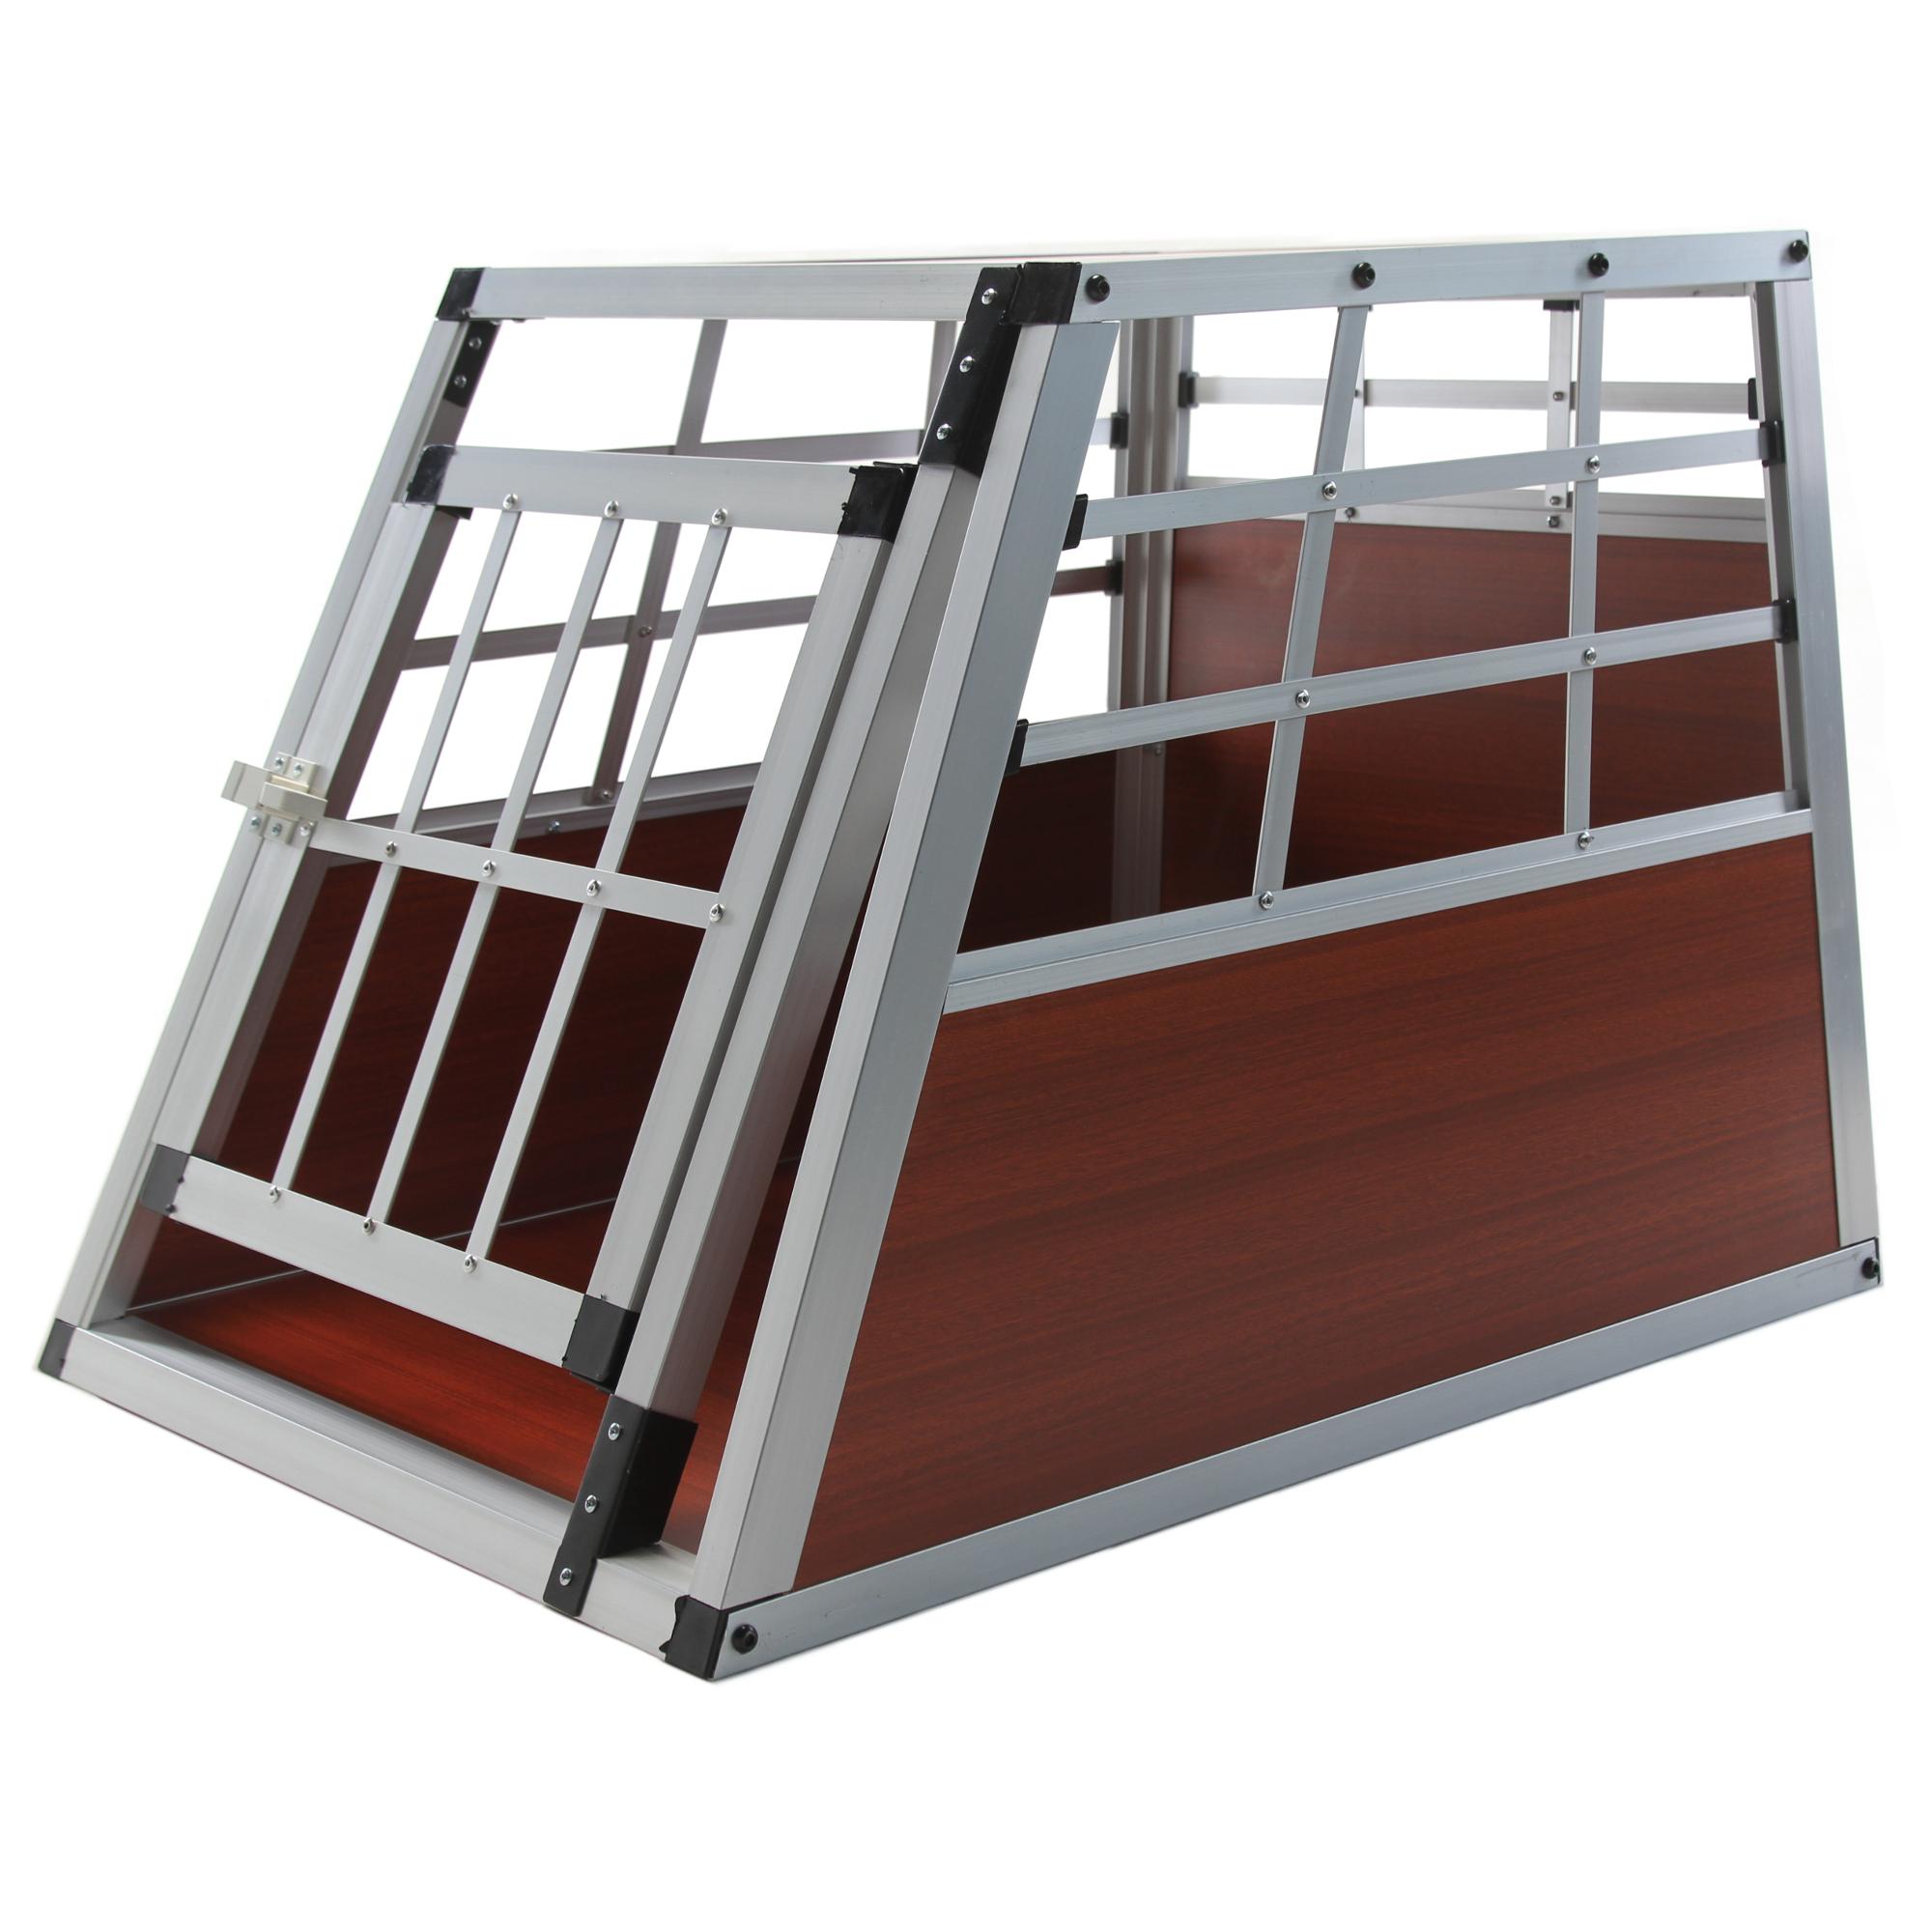 hundetransportbox metall s auto gitterbox kleine hunde alu hundebox kofferraum ebay. Black Bedroom Furniture Sets. Home Design Ideas